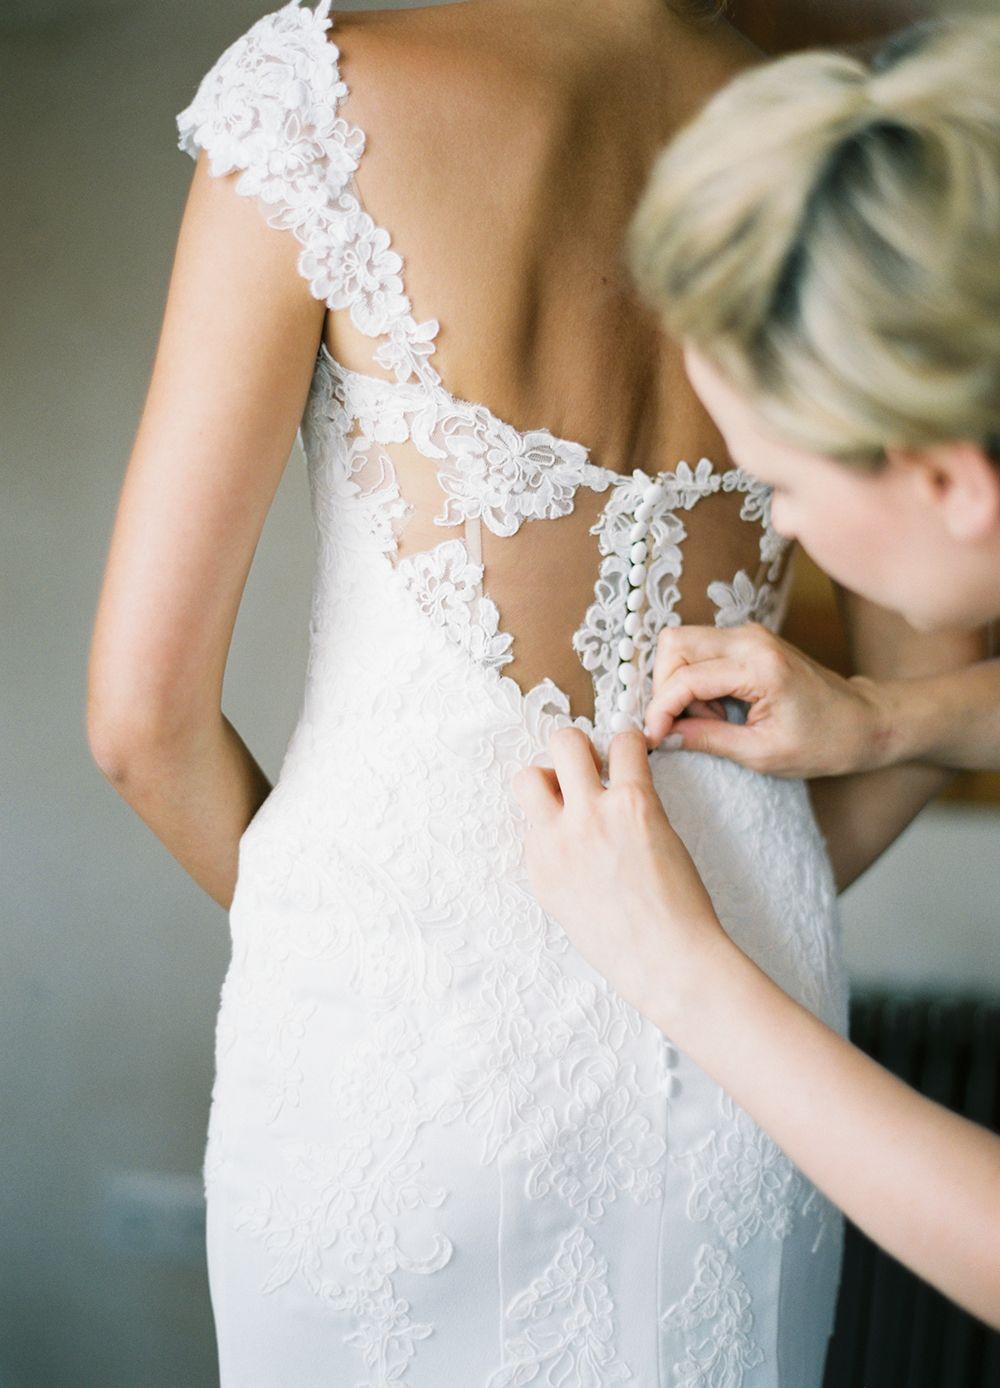 Spanish ruffle lace wedding dress